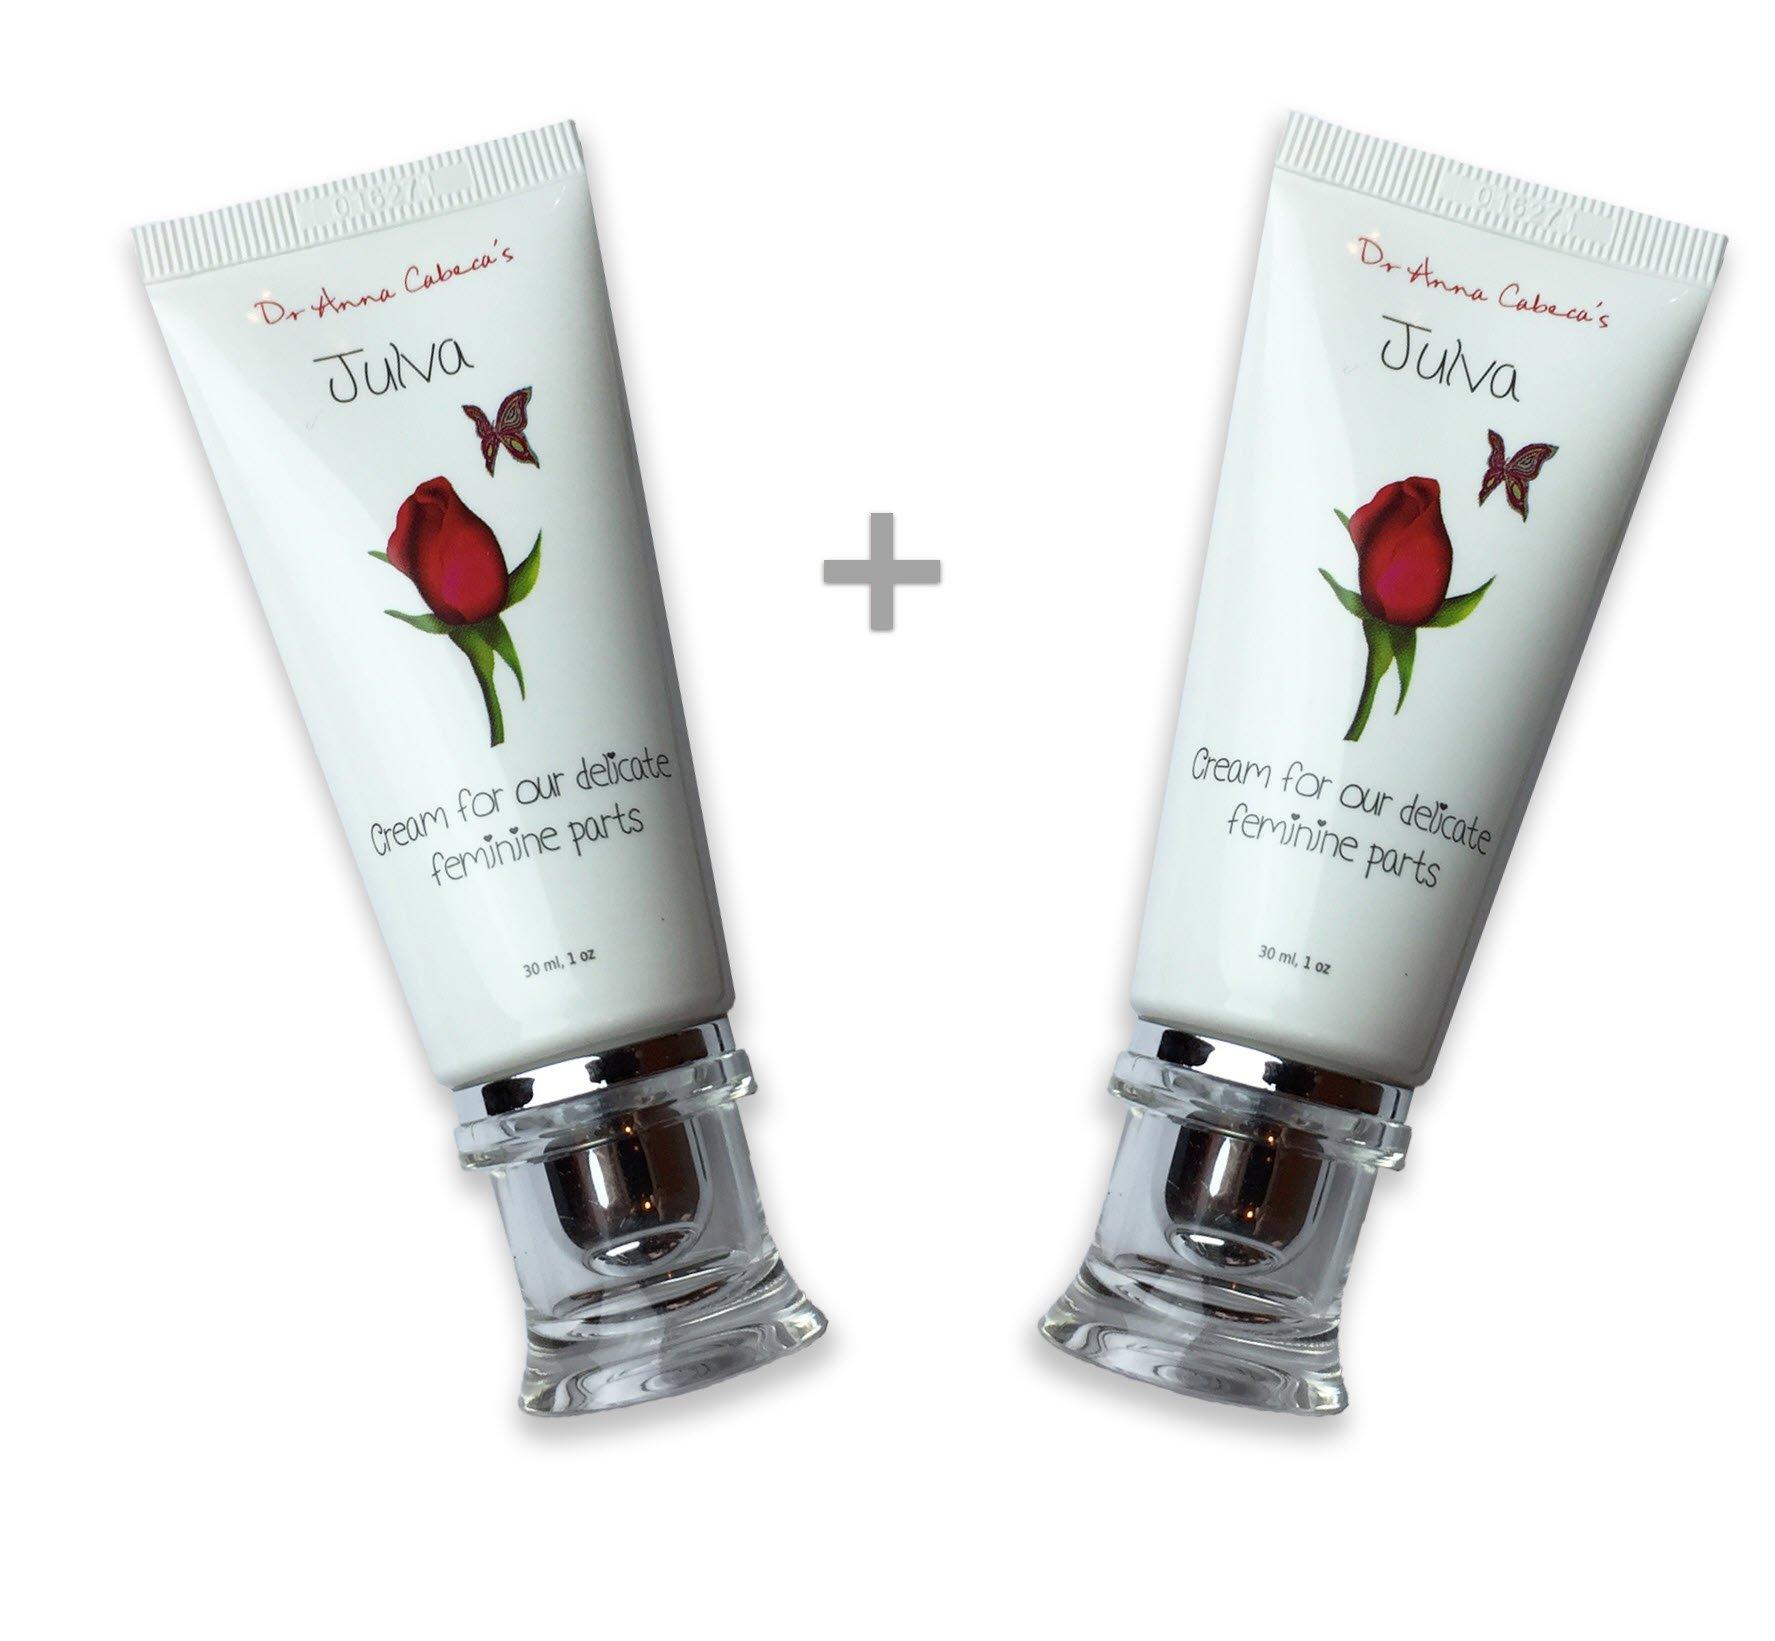 Julva Vaginal Cream Personal Moisturizer - Vaginal Health Moisturizer, Vulva Cream for Dryness, Irritation, Vagina Discomfort Due to Menopause, Thinning (2TUBES)